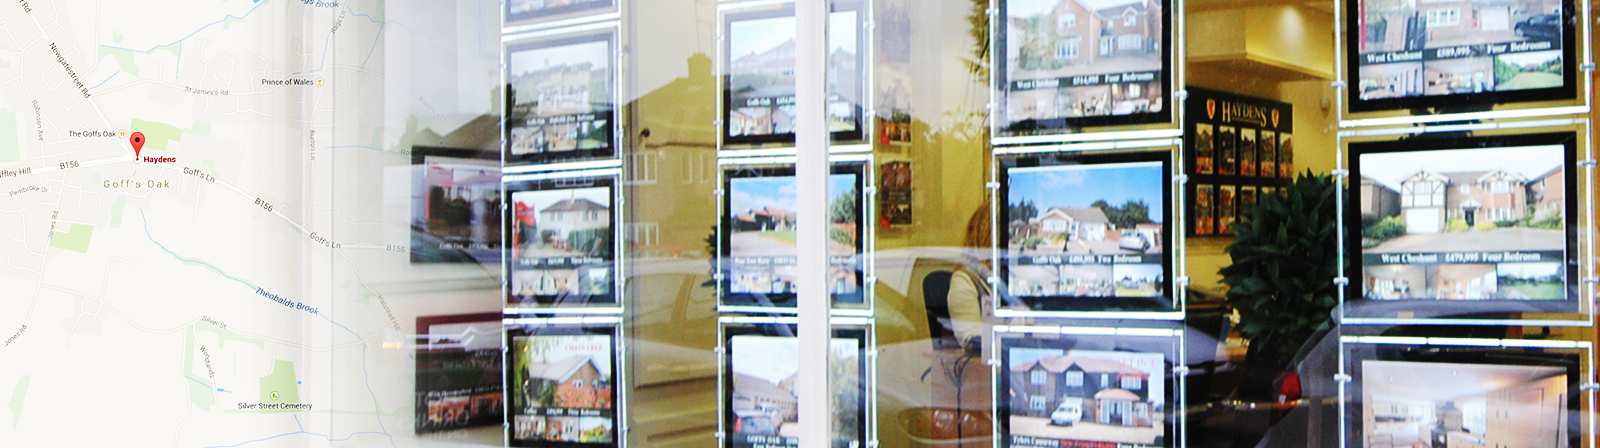 window-display-banenr_4